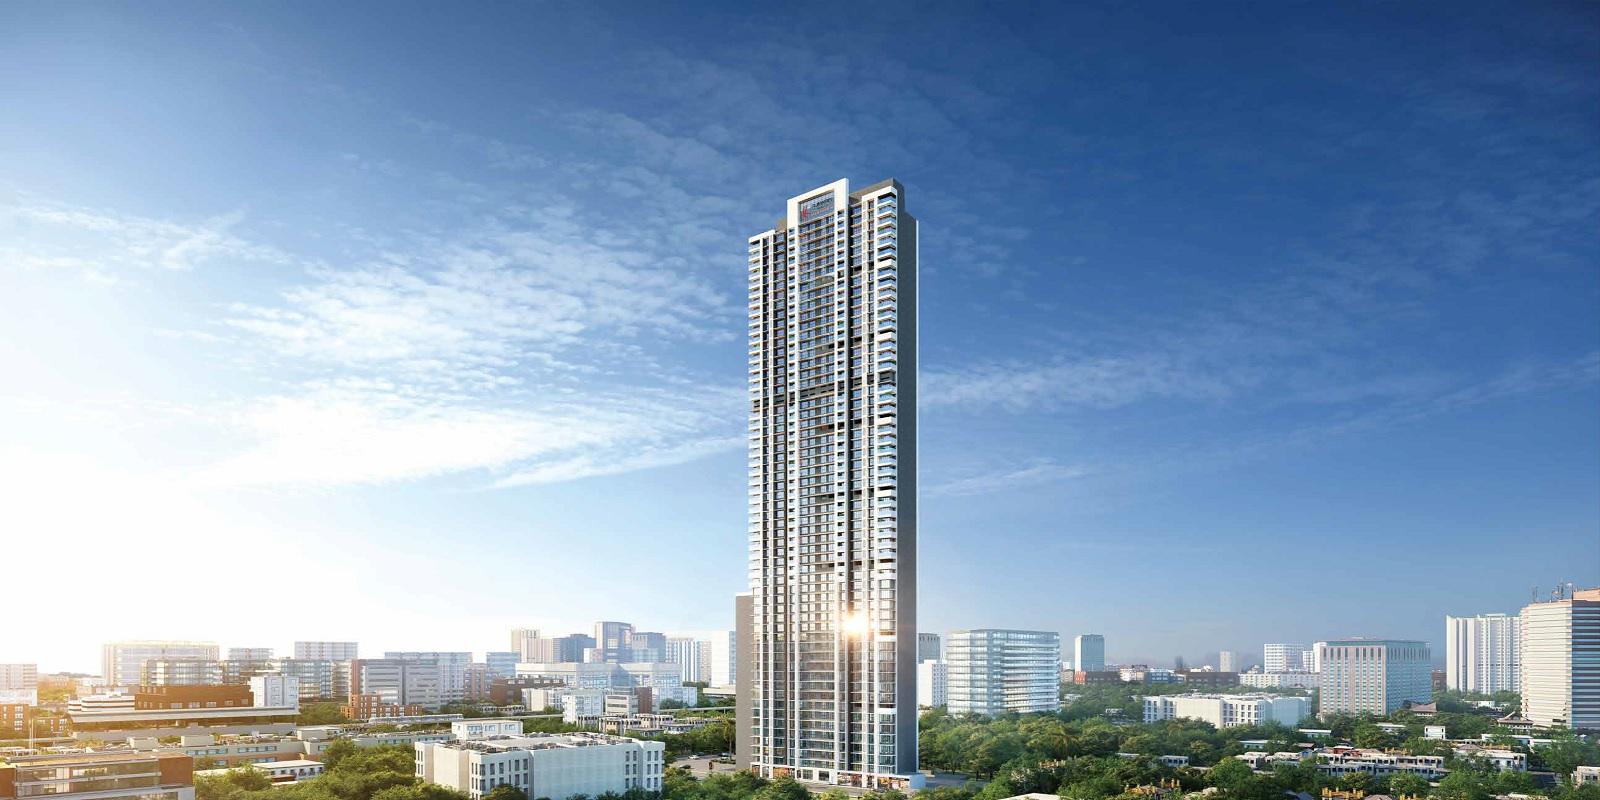 ruparel mumbai xl project project large image1